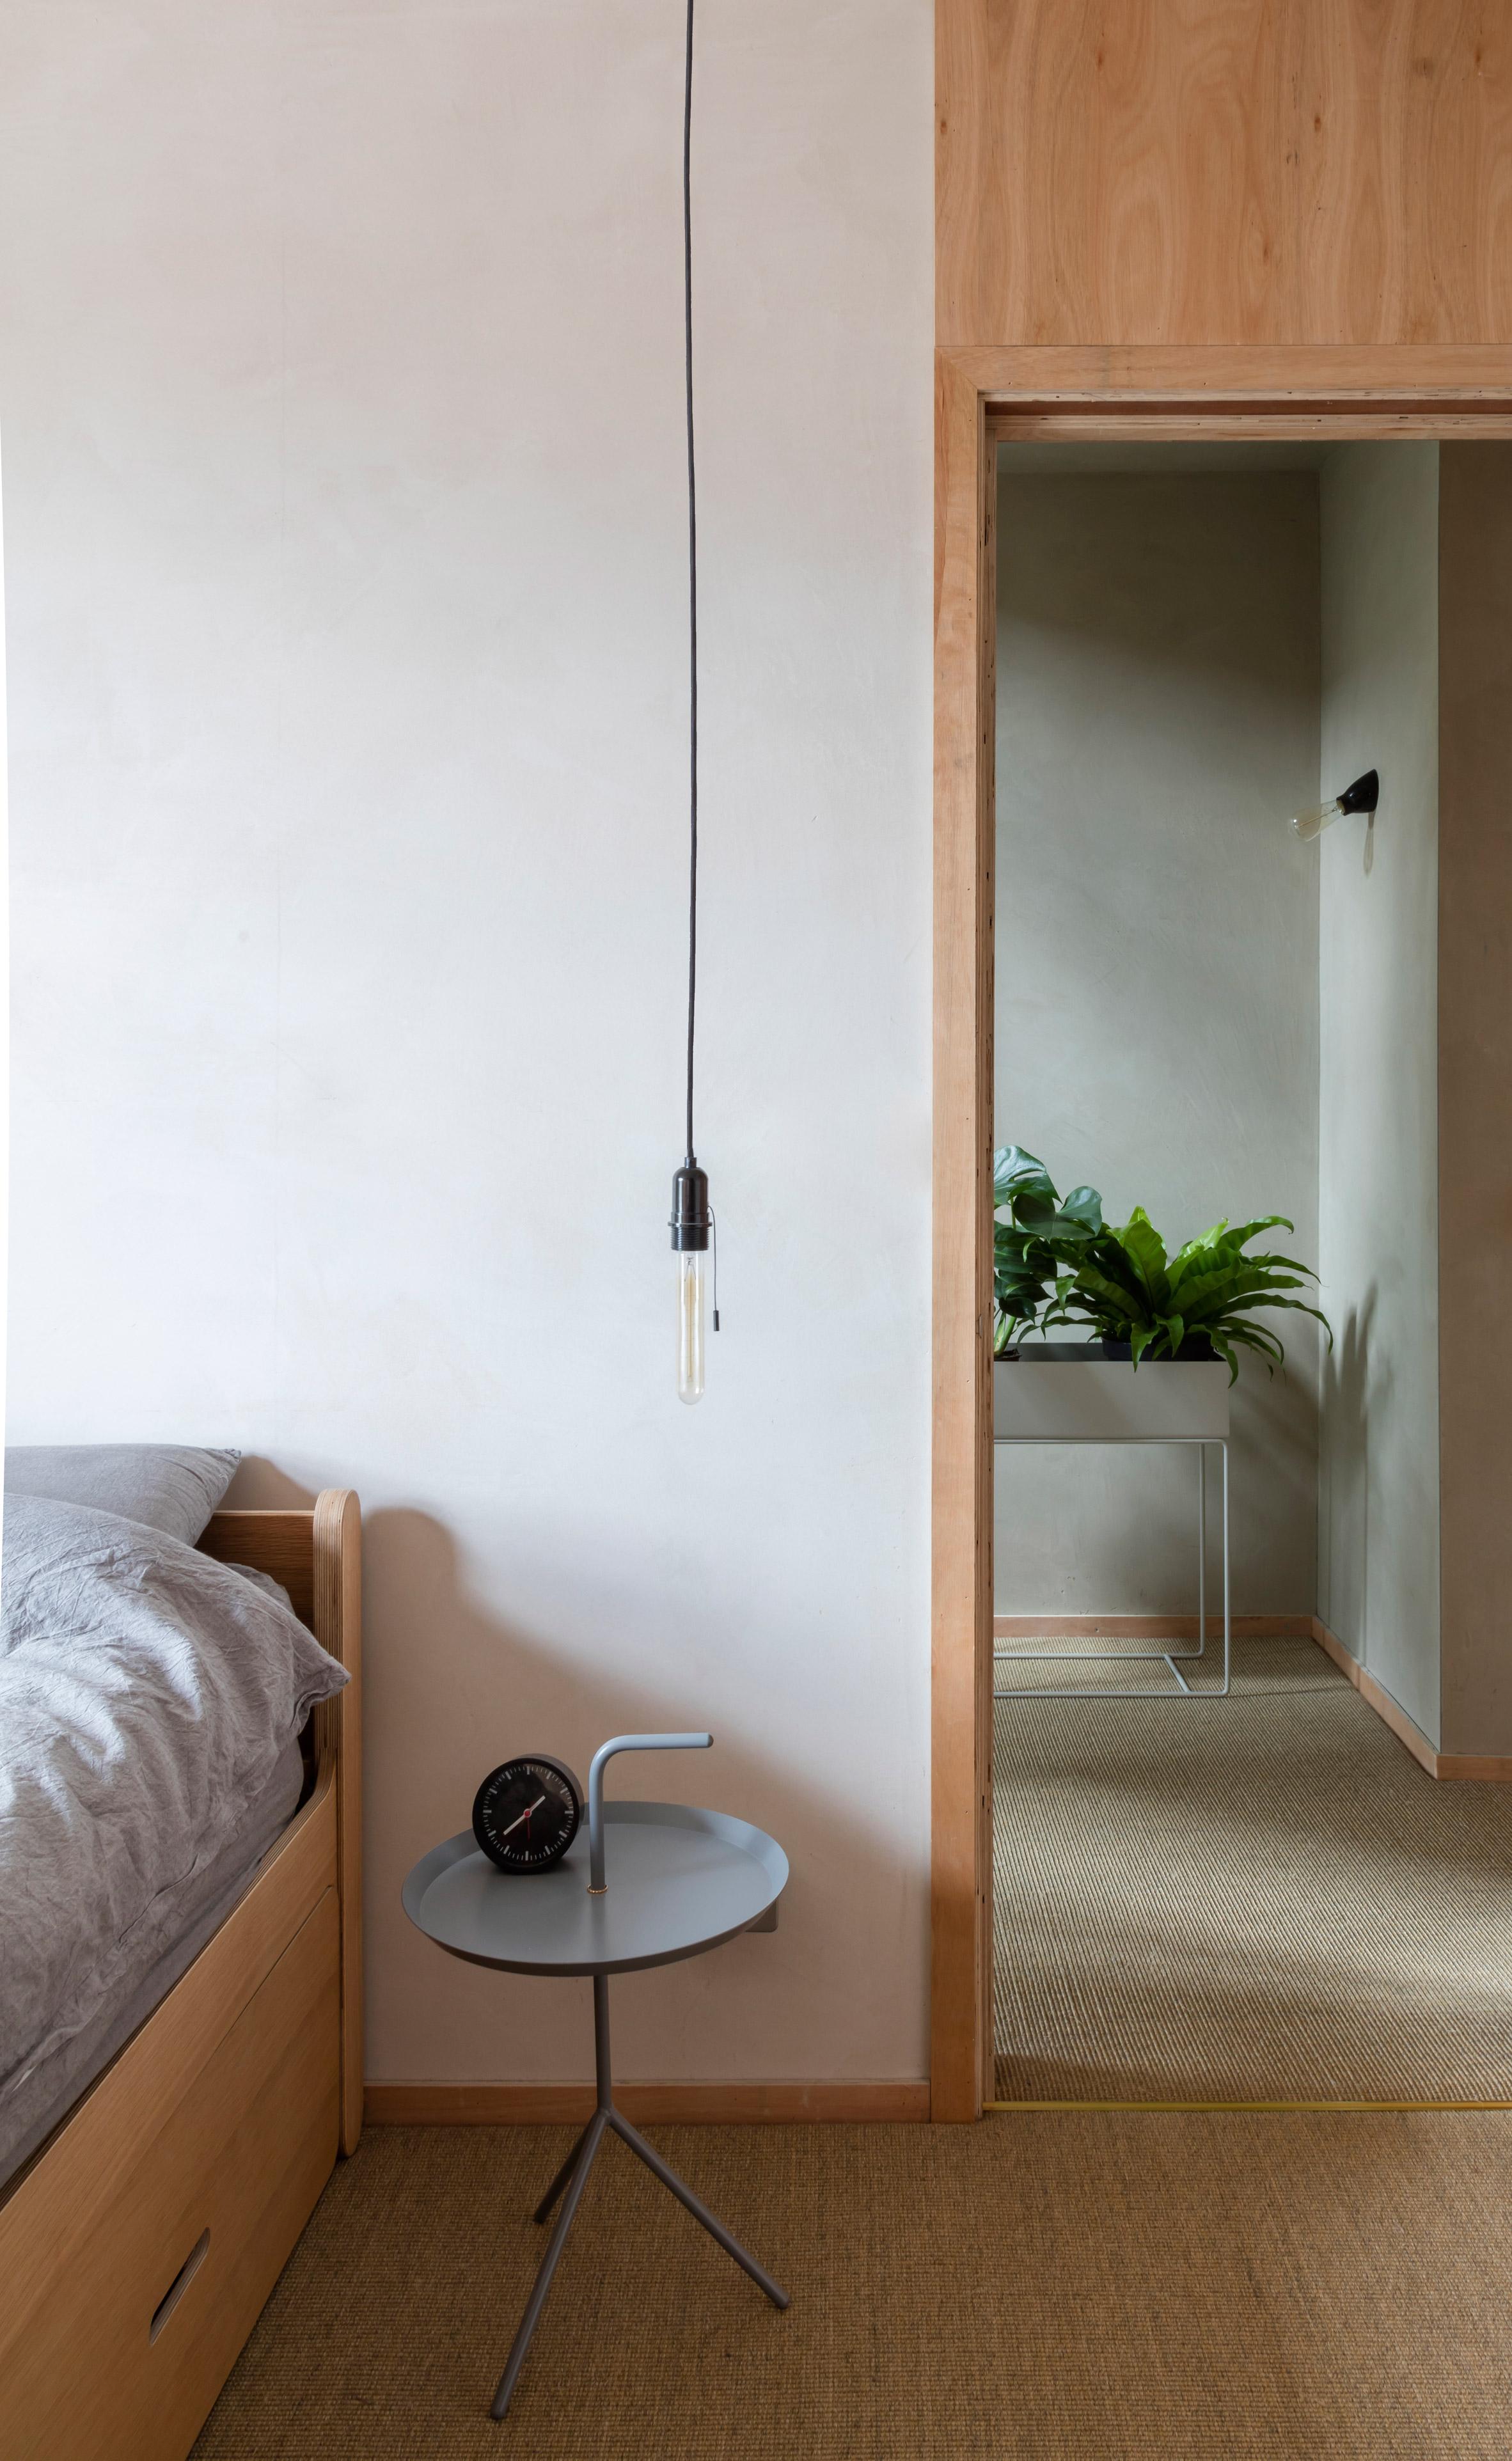 Japanese minimalism meets Victorian bones in London apartment revamp